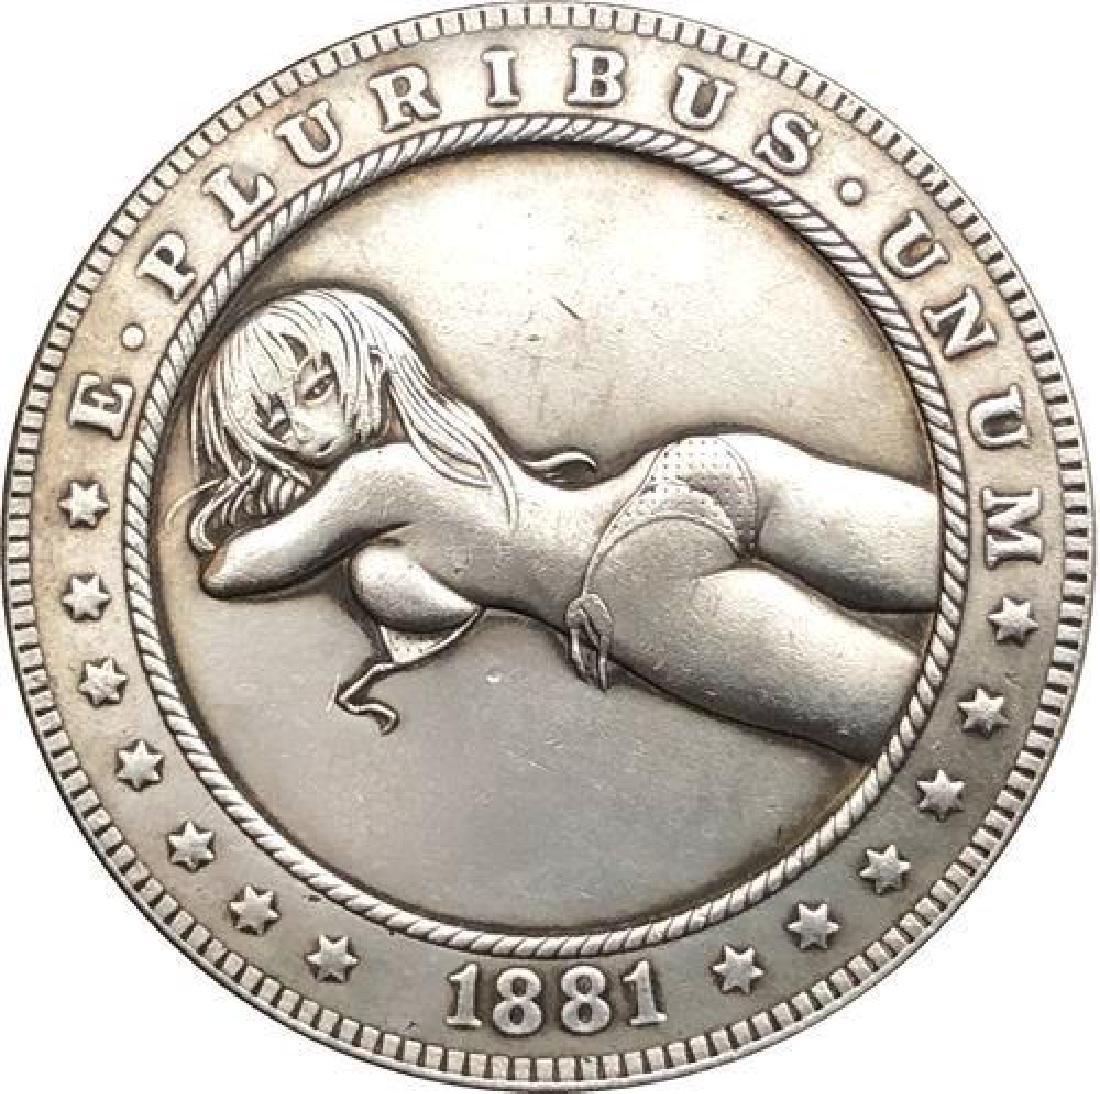 1881 USA Woman in Bikini #1 One Dollar Coin